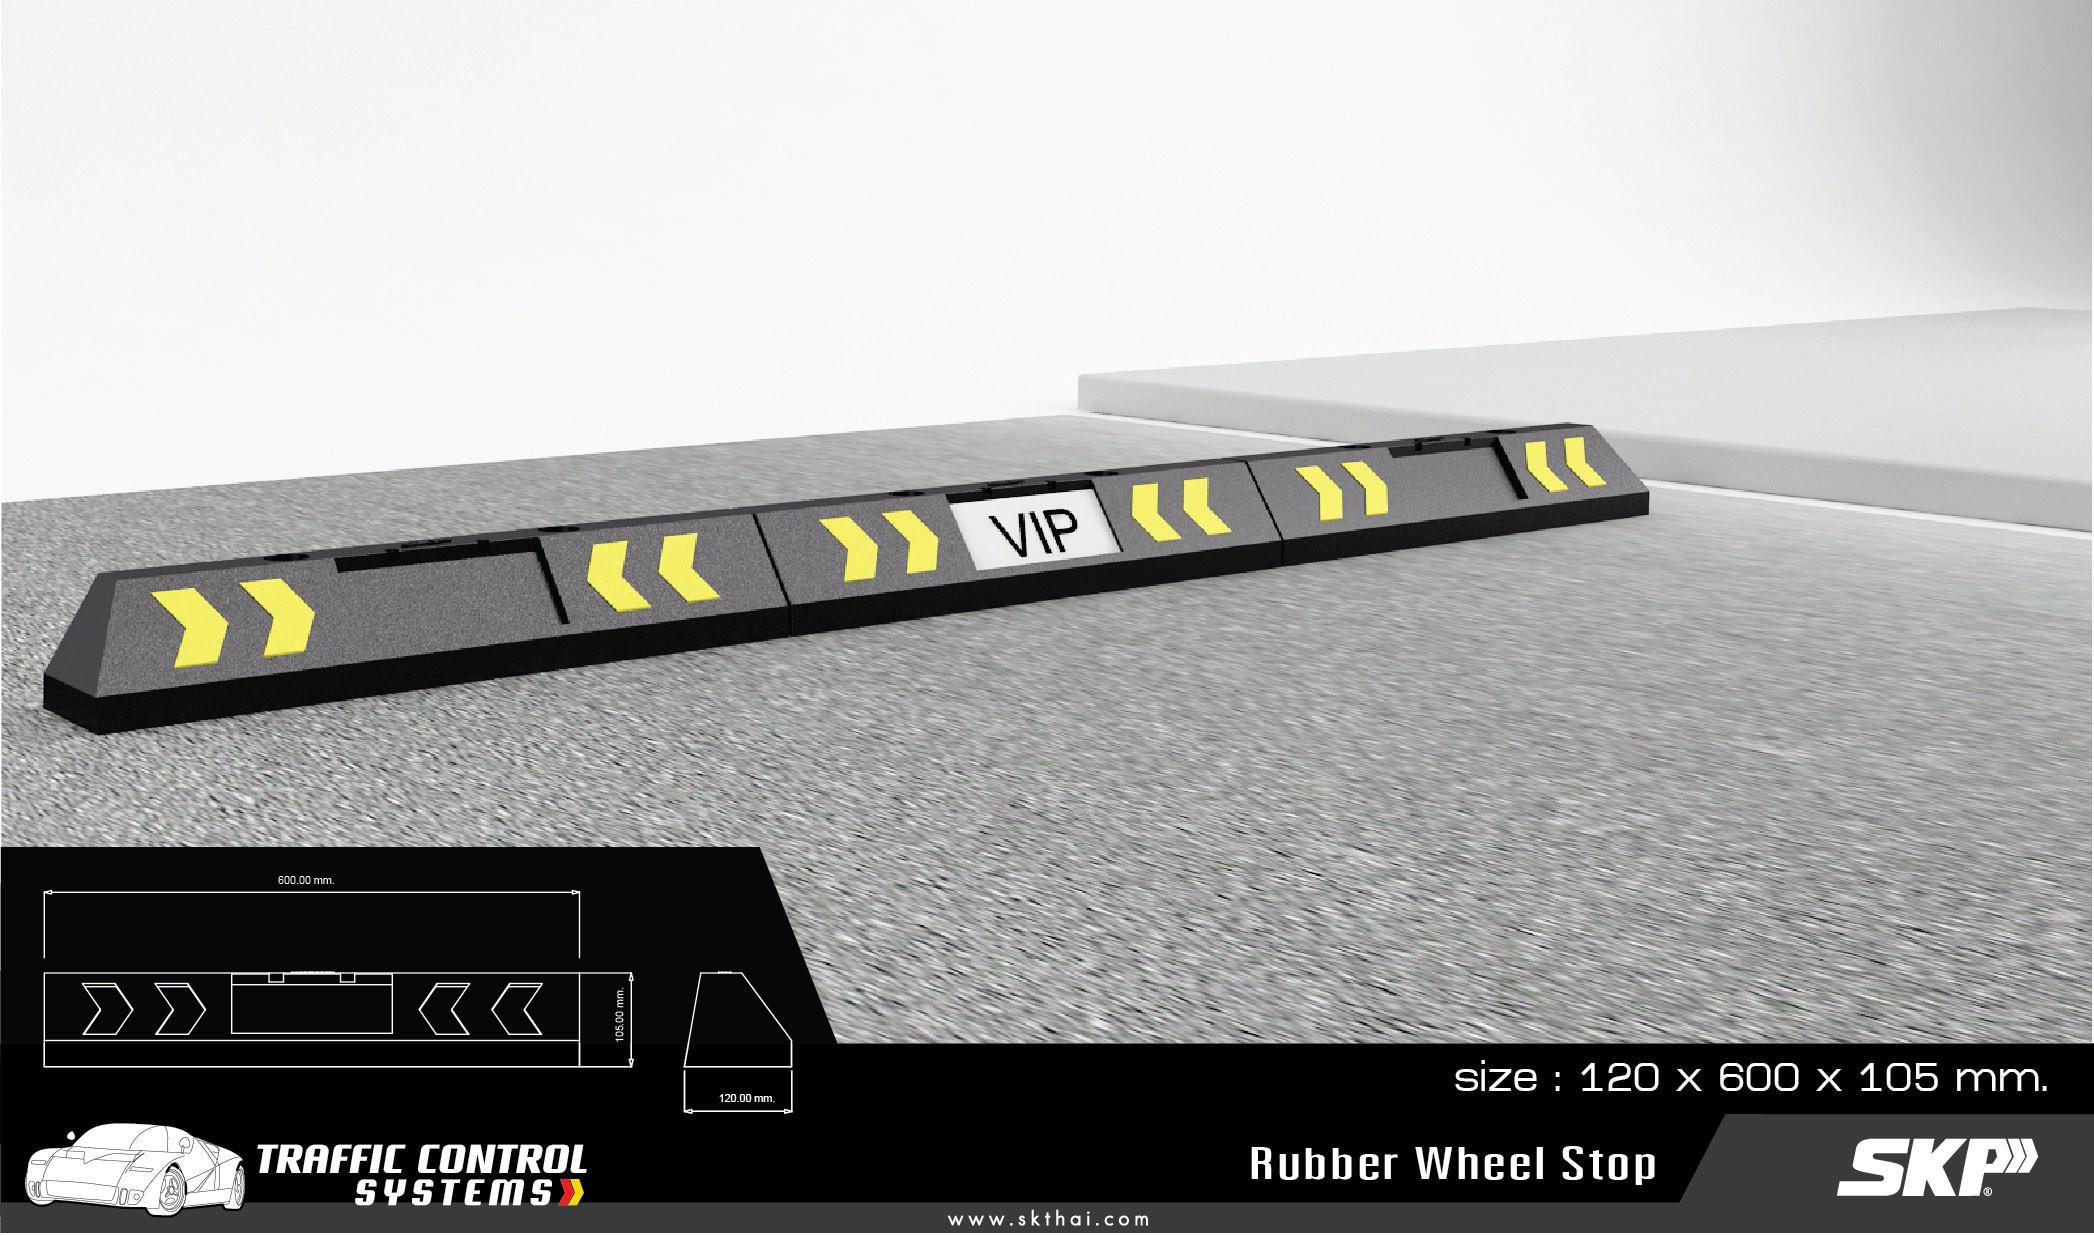 Rubber Wheel Stop